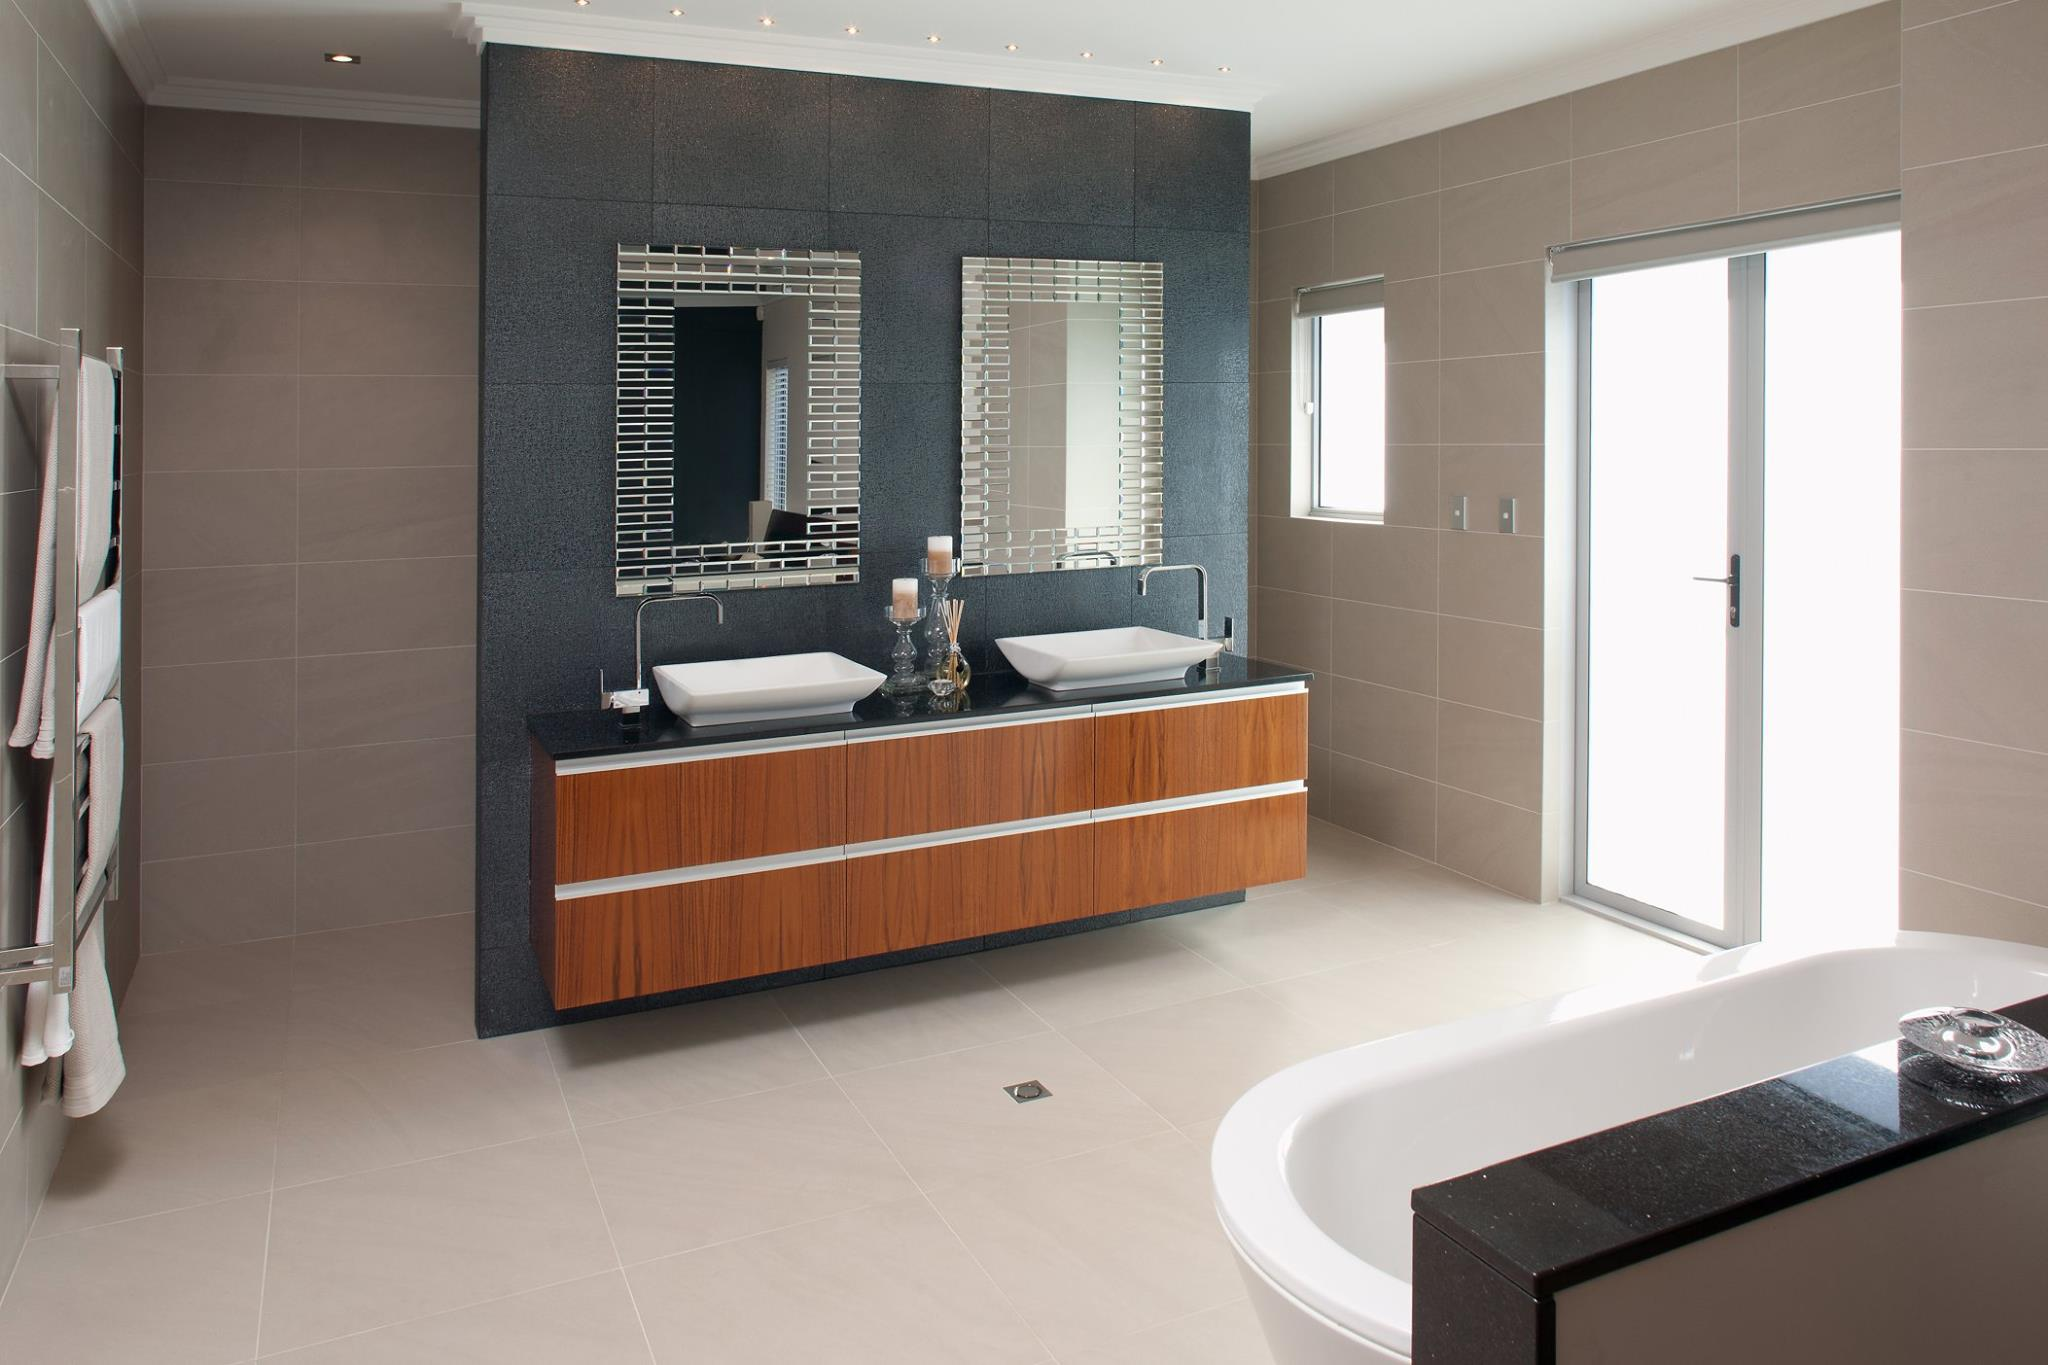 Great Bath Shower Tile Designs Small Plan Your Bathroom Design Rectangular Bathroom Mirror Circle Bath Fixtures Store Youthful Bathroom Designer Cost FreshBest Ceramic Tile For Bathroom Floors Bathroom Renovation Prospect AllStyle Bathrooms 0413768997